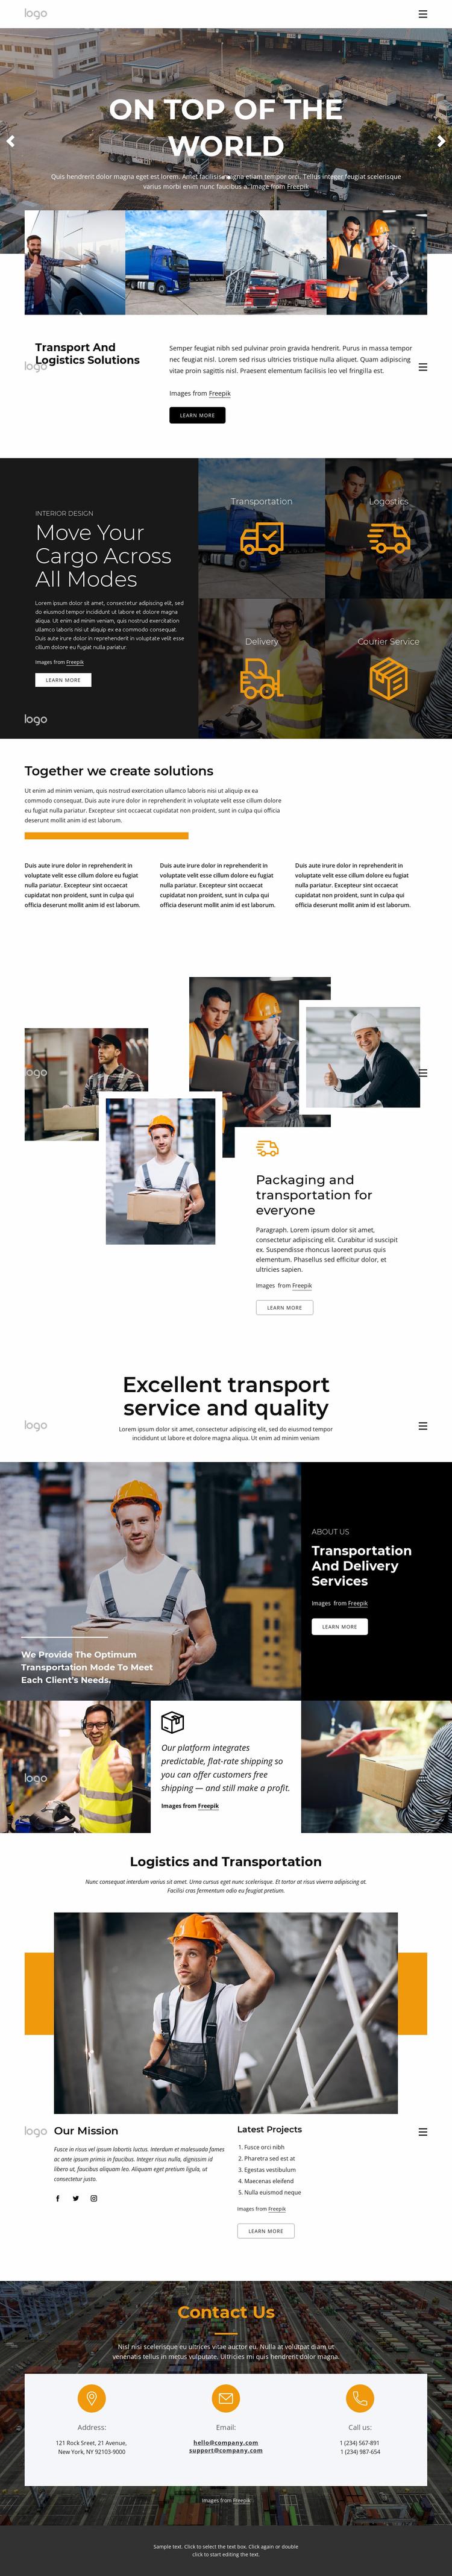 Transportation and logistics management Website Template